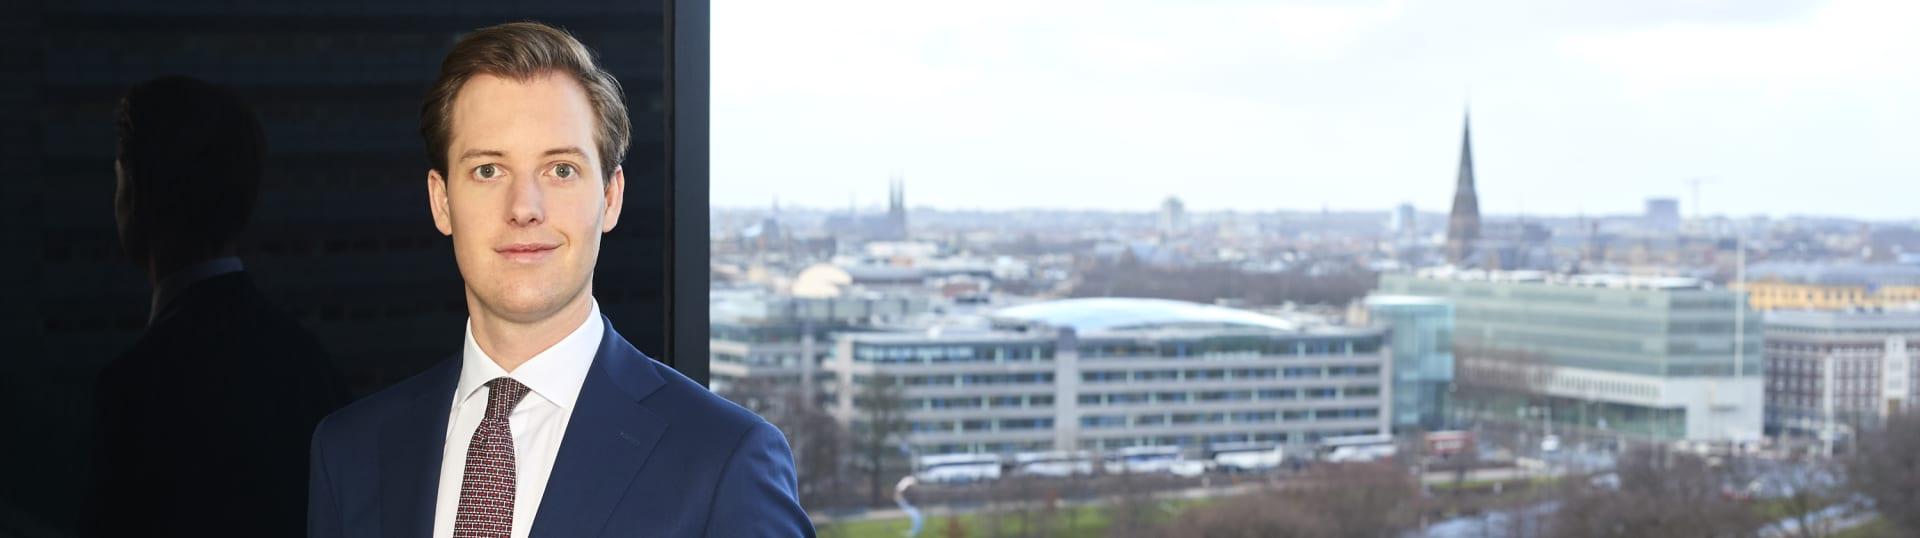 Michael van Rijckevorsel, advocaat Pels Rijcken